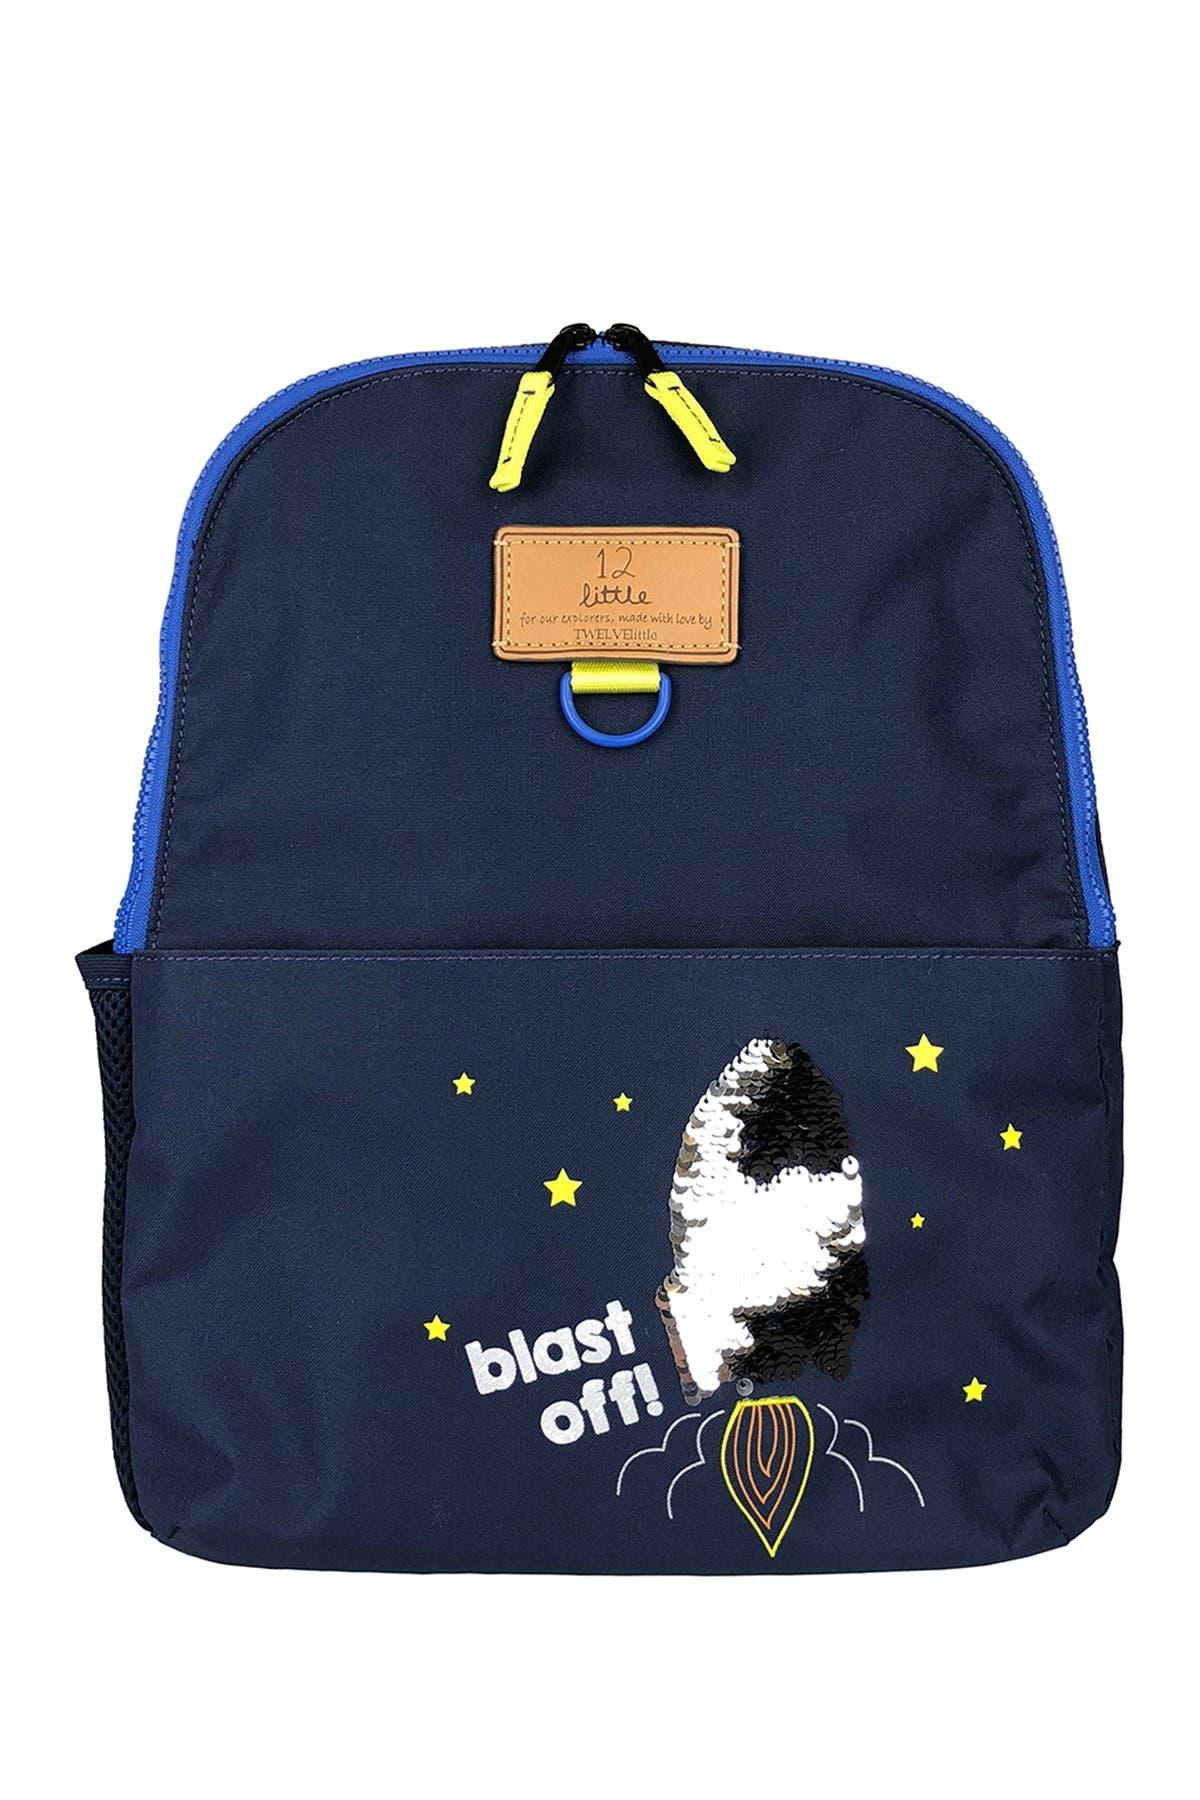 Image of TWELVELITTLE Adventure Waterproof Backpack